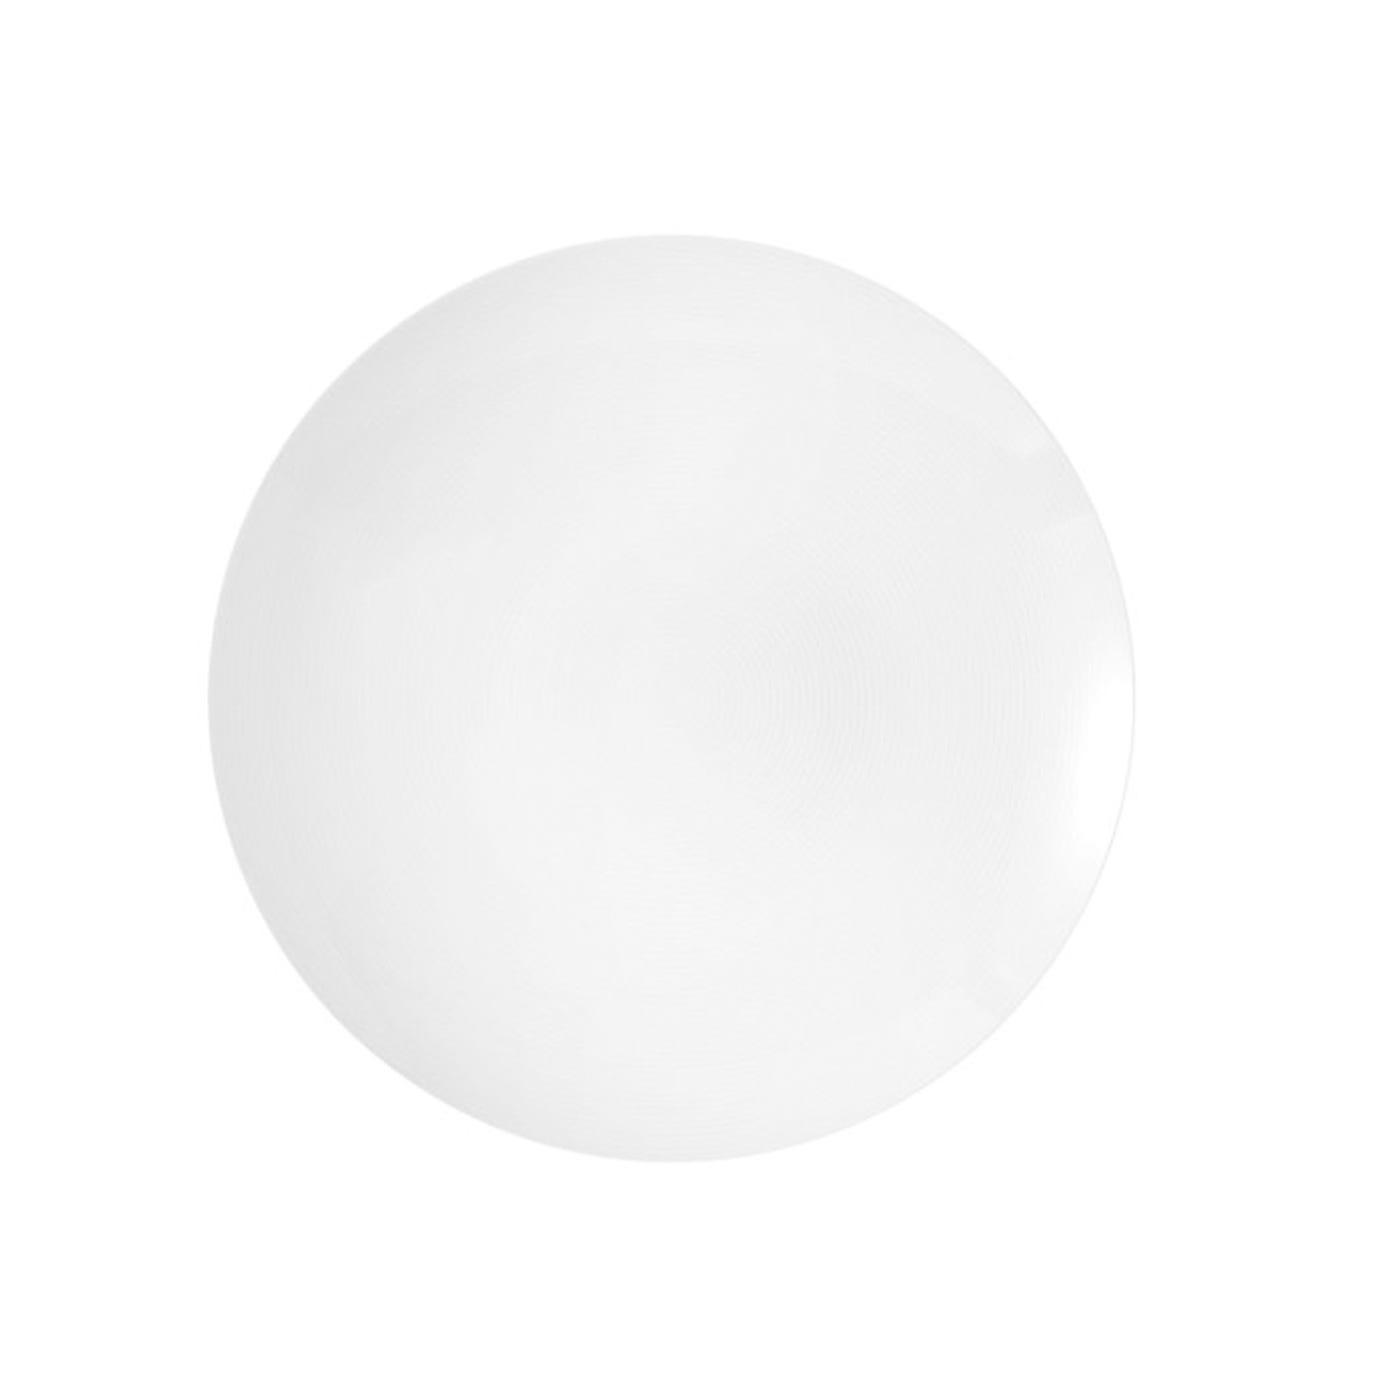 Loft White Side Plate